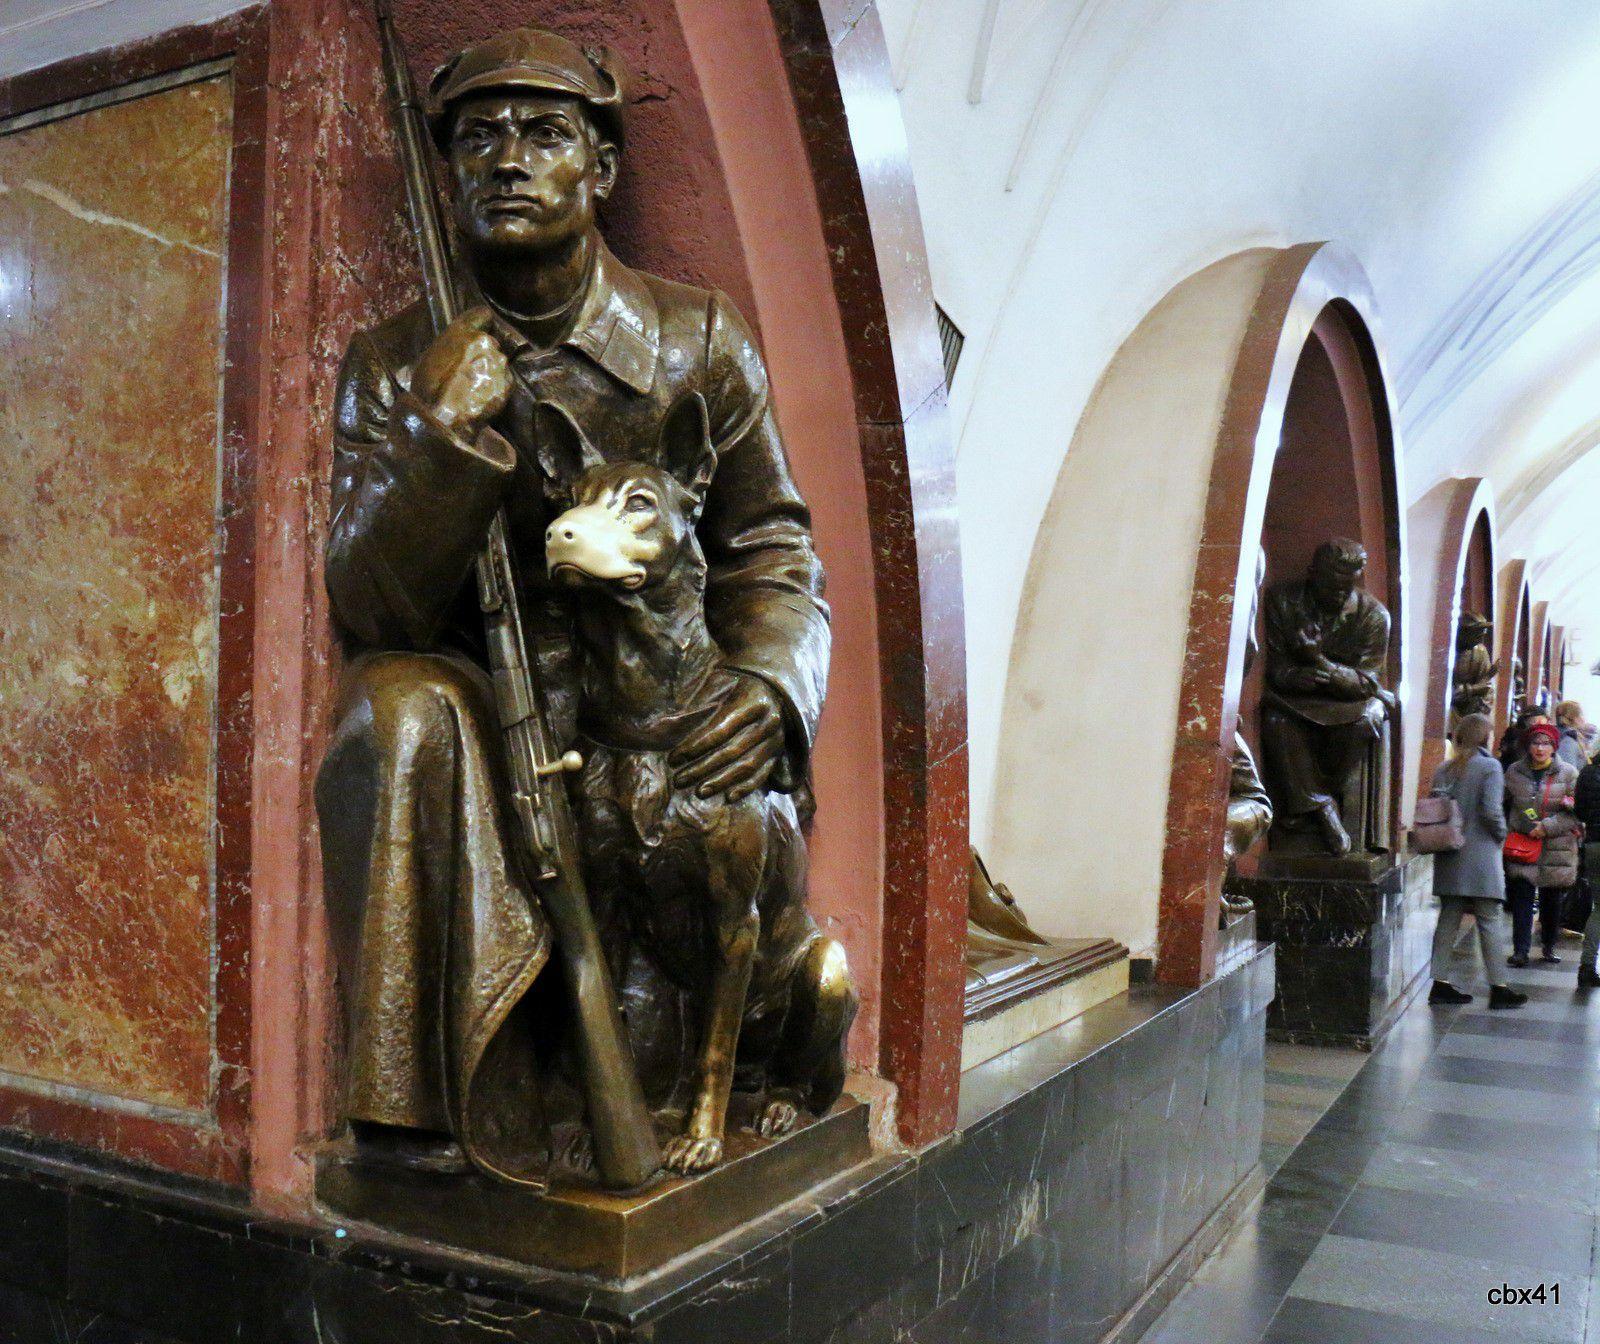 Statues de la station Ploshchad Revolyutsii du métro de Moscou